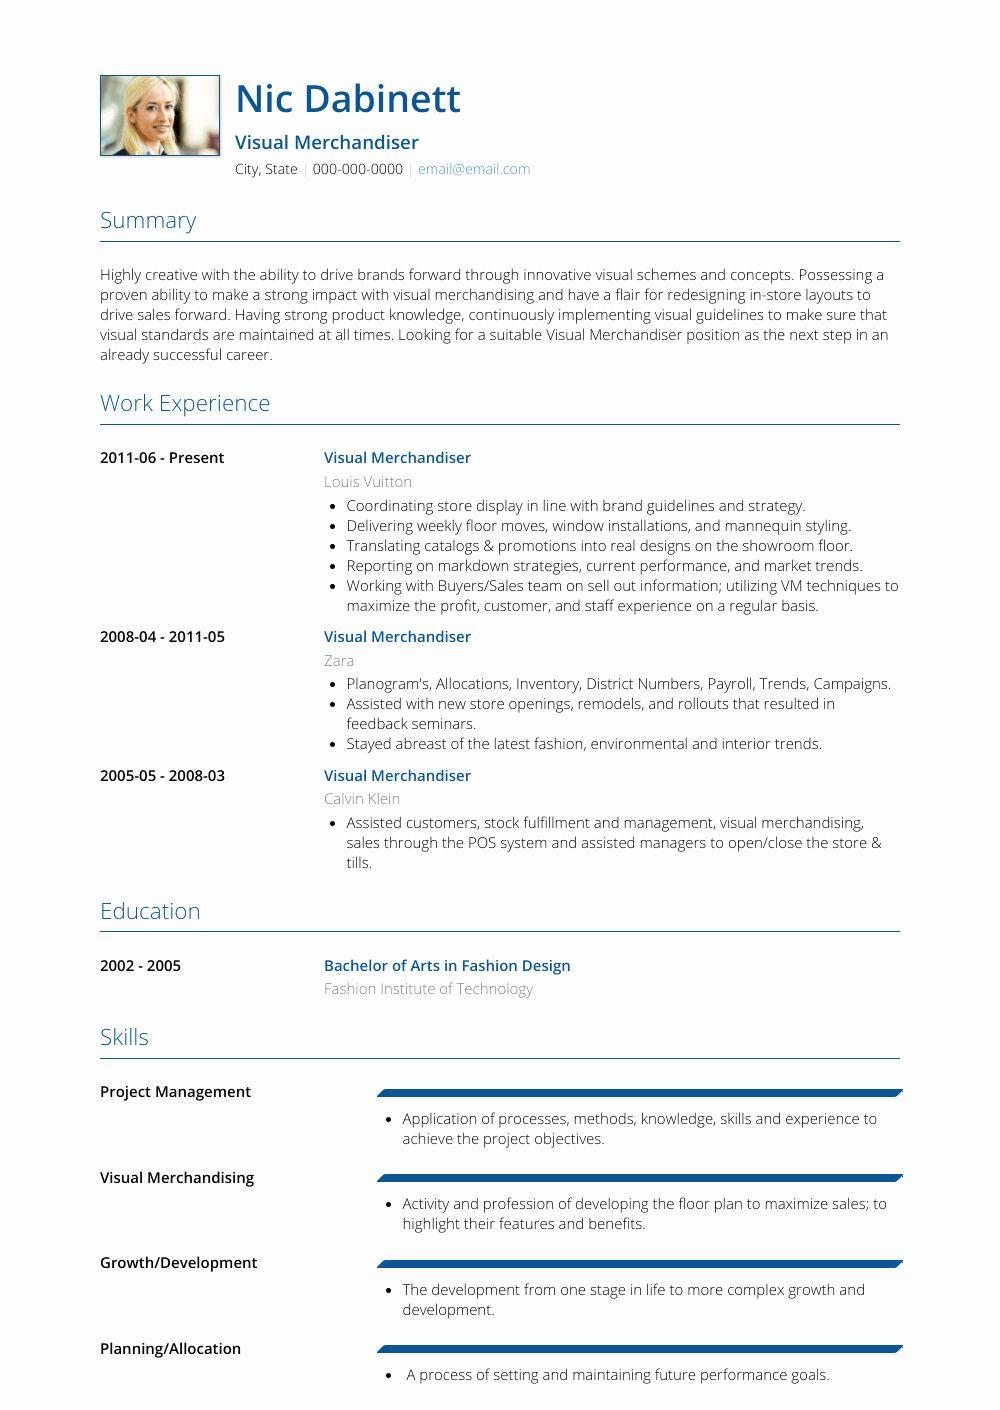 25 visual merchandising resume samples in 2020 visual